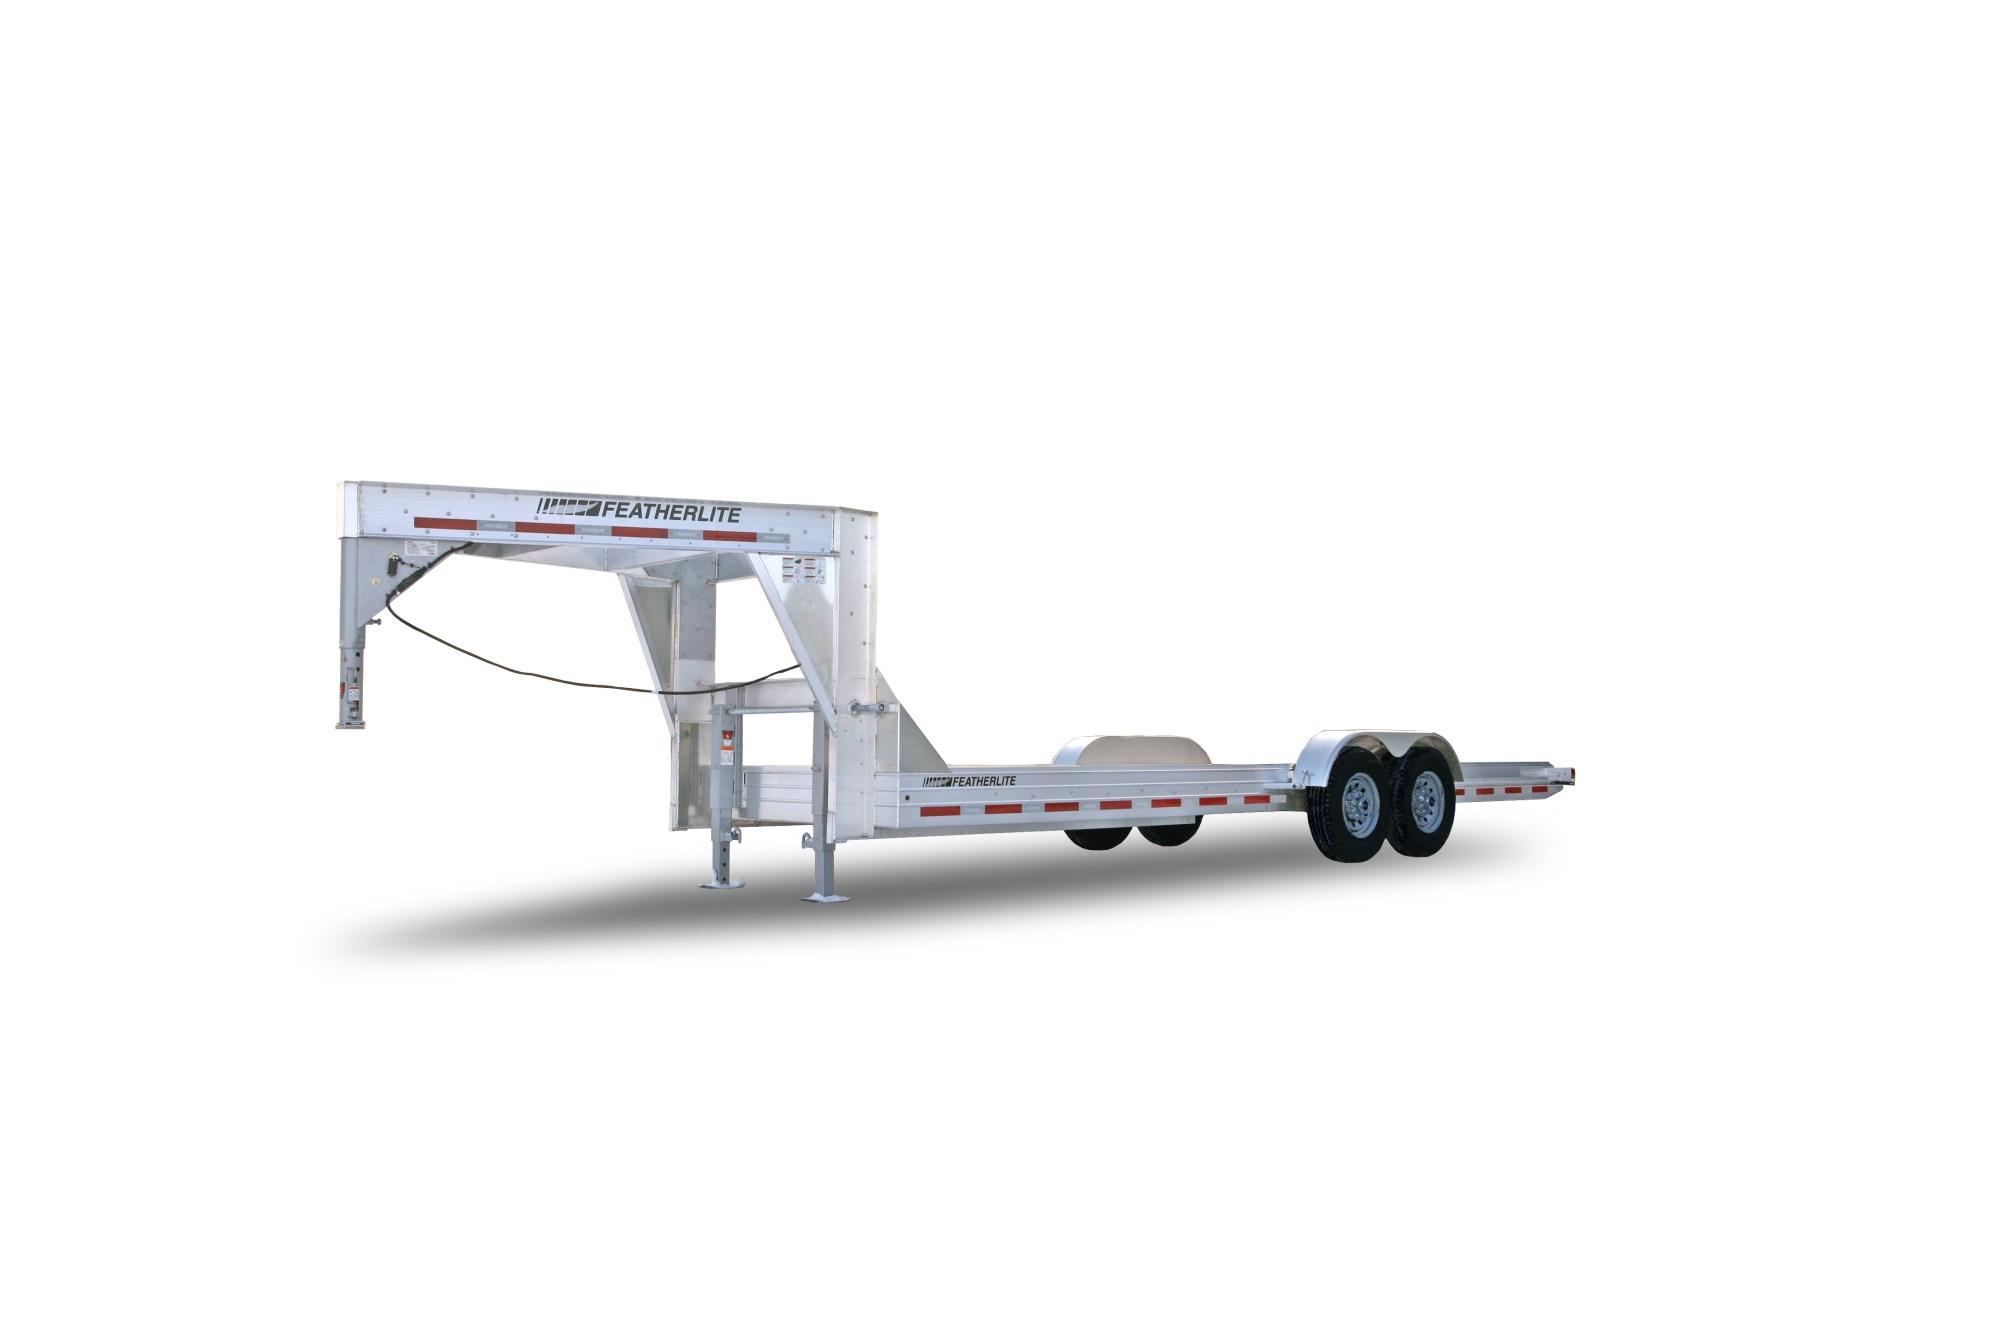 hight resolution of car hauler trailers car hauler trailers from carson mazda cx 5 trailer wiring diagram 2014 mazda